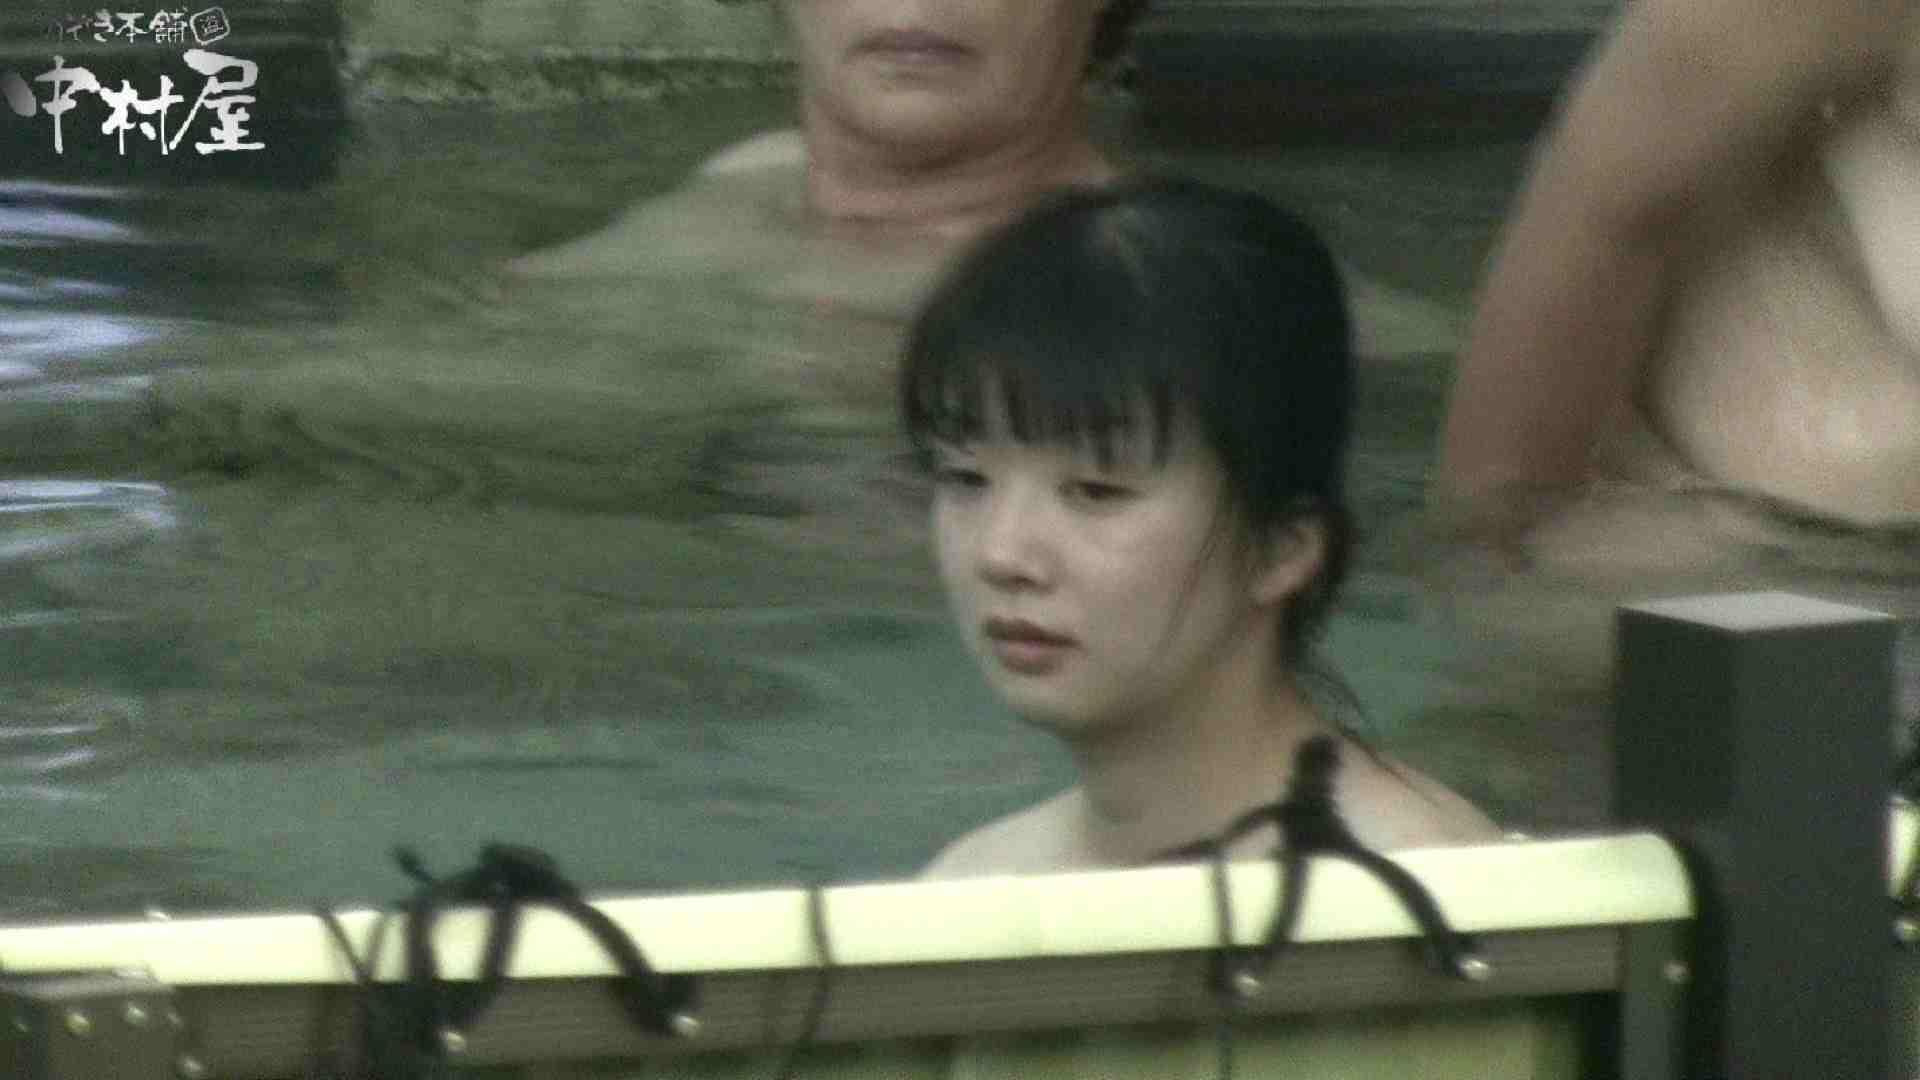 Aquaな露天風呂Vol.904 露天風呂 AV無料動画キャプチャ 56連発 2